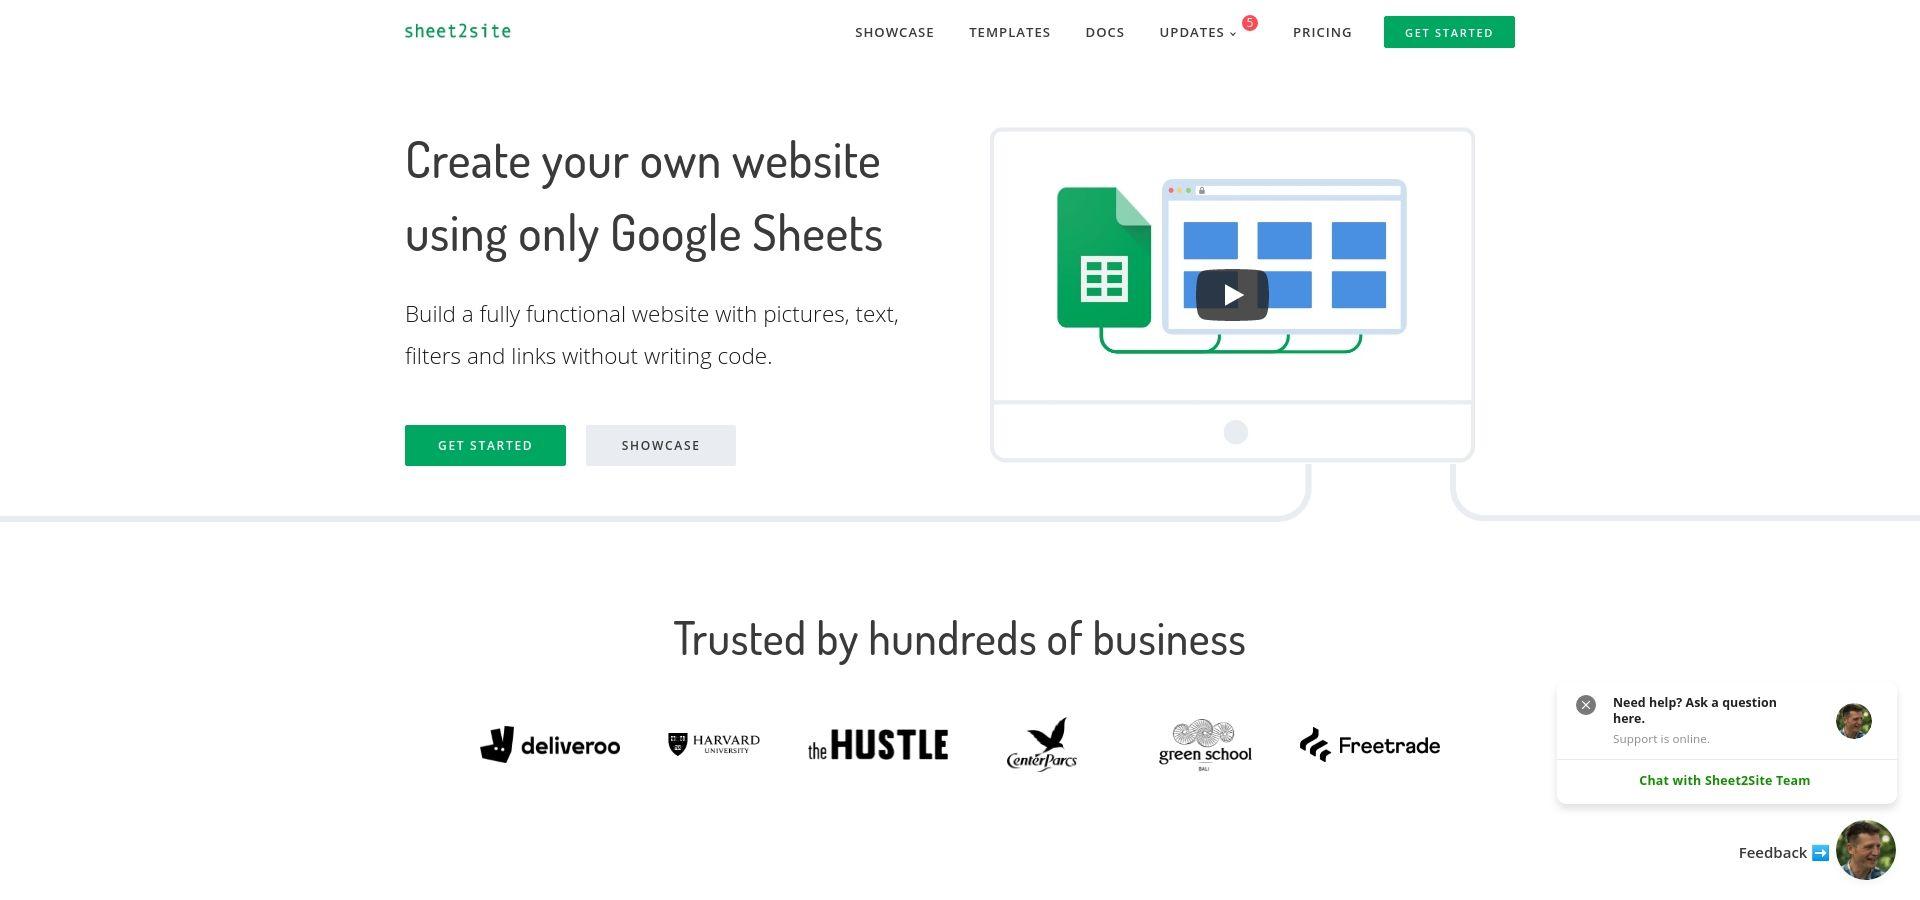 Sheet2Site: Website Builder Using Google Sheets